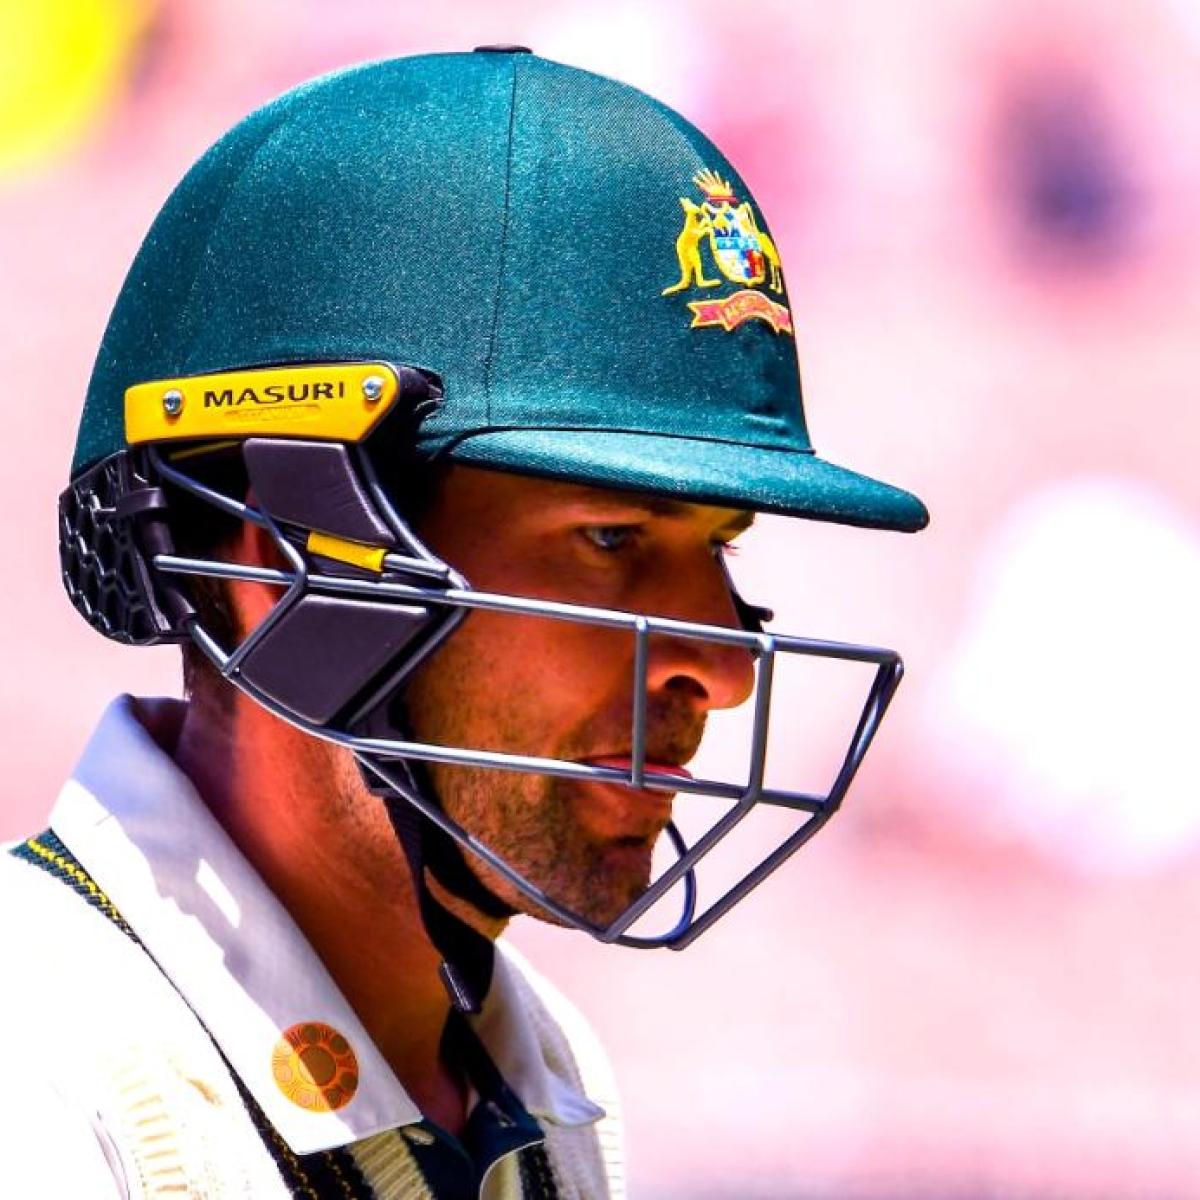 Ind vs Aus 3rd Test: David Warner, Will Pucovski added to hosts' squad, Joe Burns released